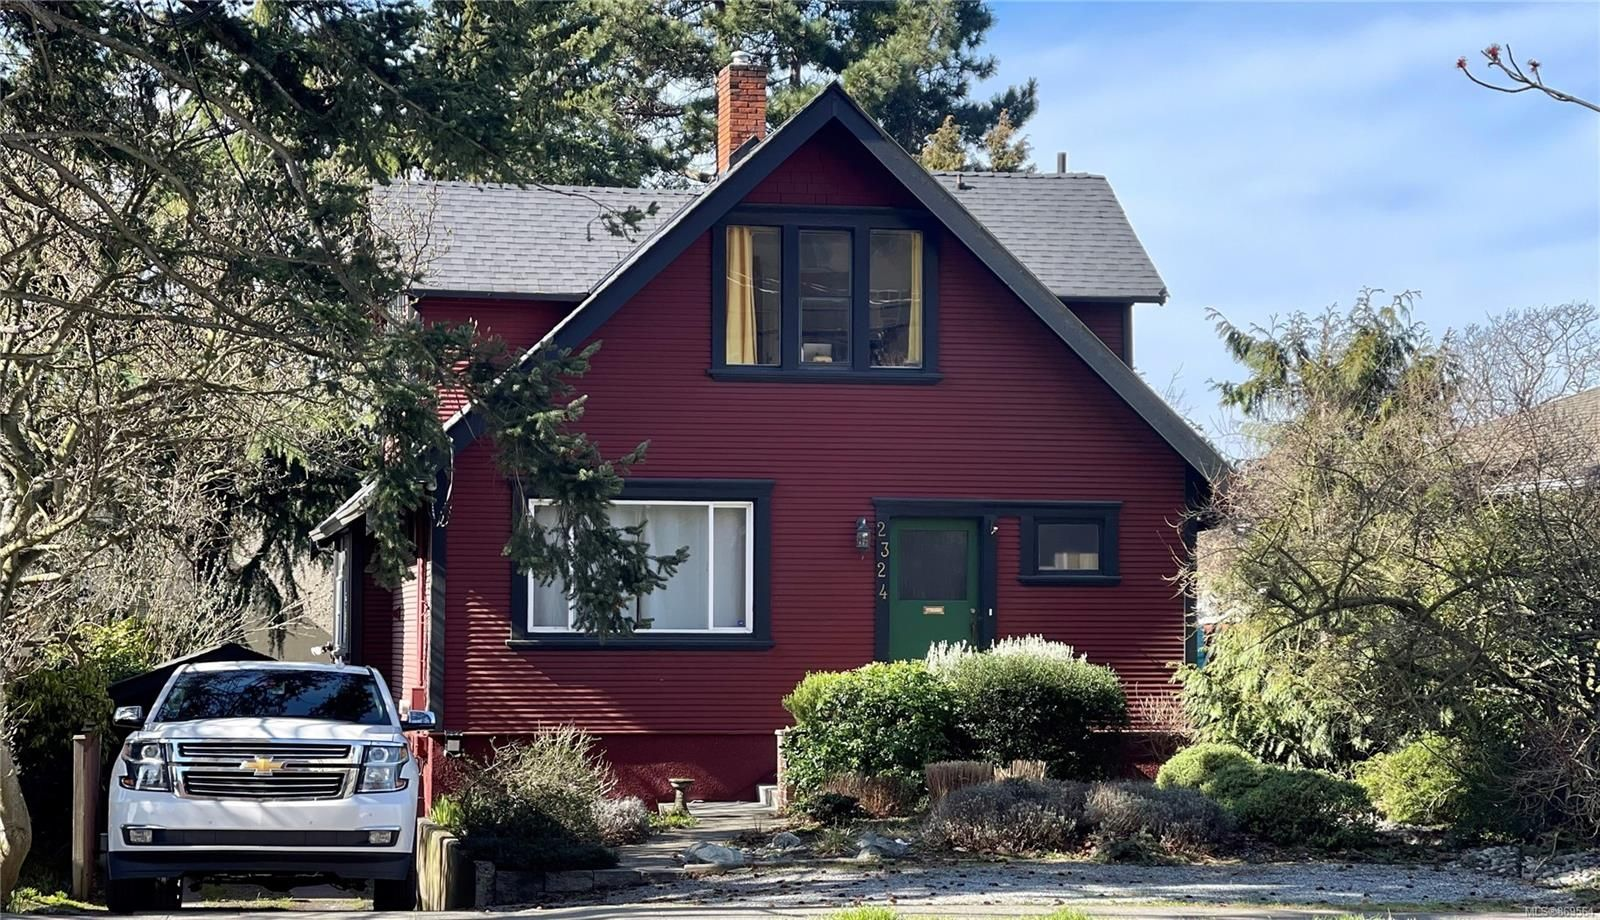 Main Photo: 2324 Richmond Rd in : Vi Jubilee House for sale (Victoria)  : MLS®# 869564